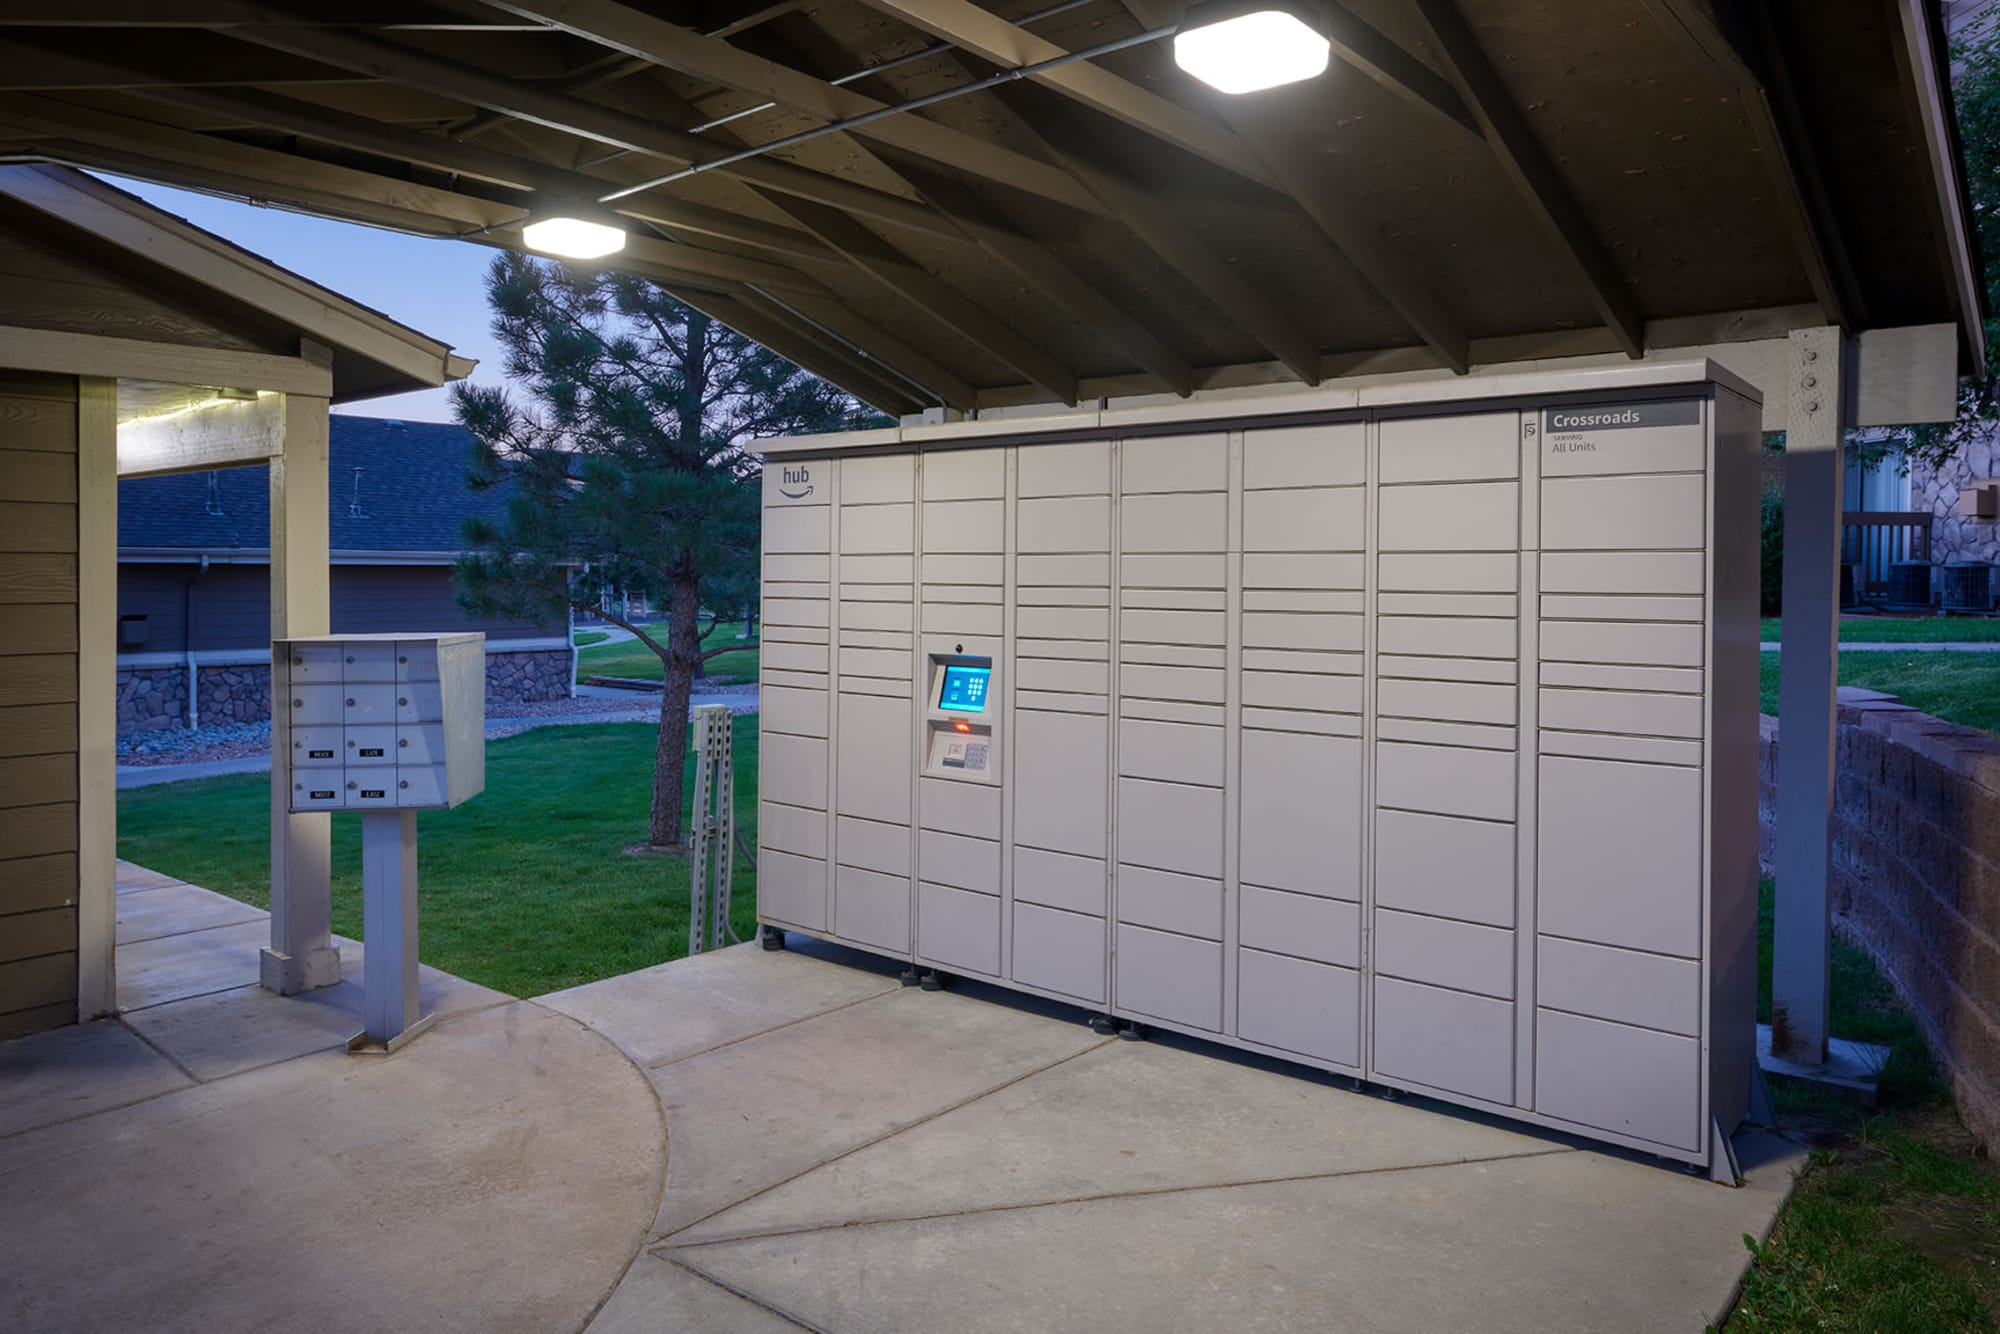 Amazon HUB Lockers at Crossroads at City Center Apartments in Aurora, Colorado